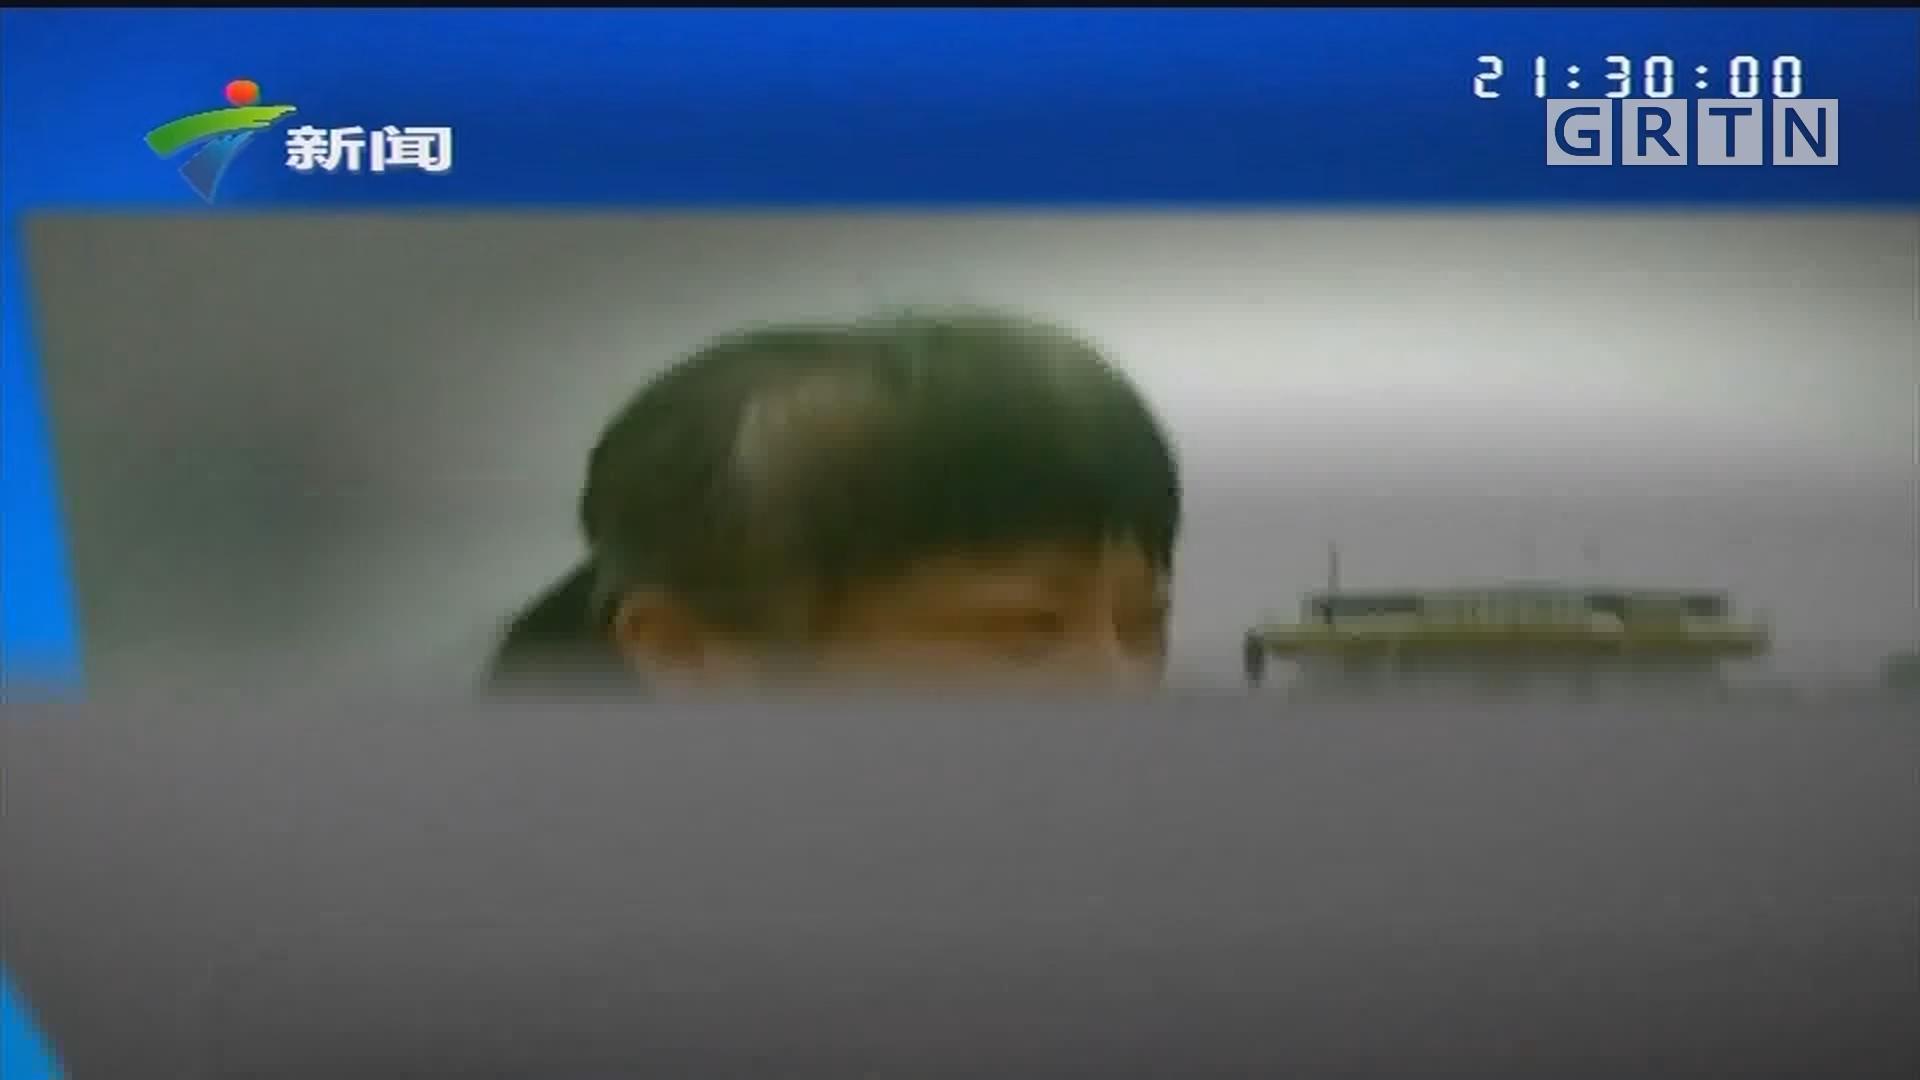 [HD][2019-11-06]新闻故事:骗局1040